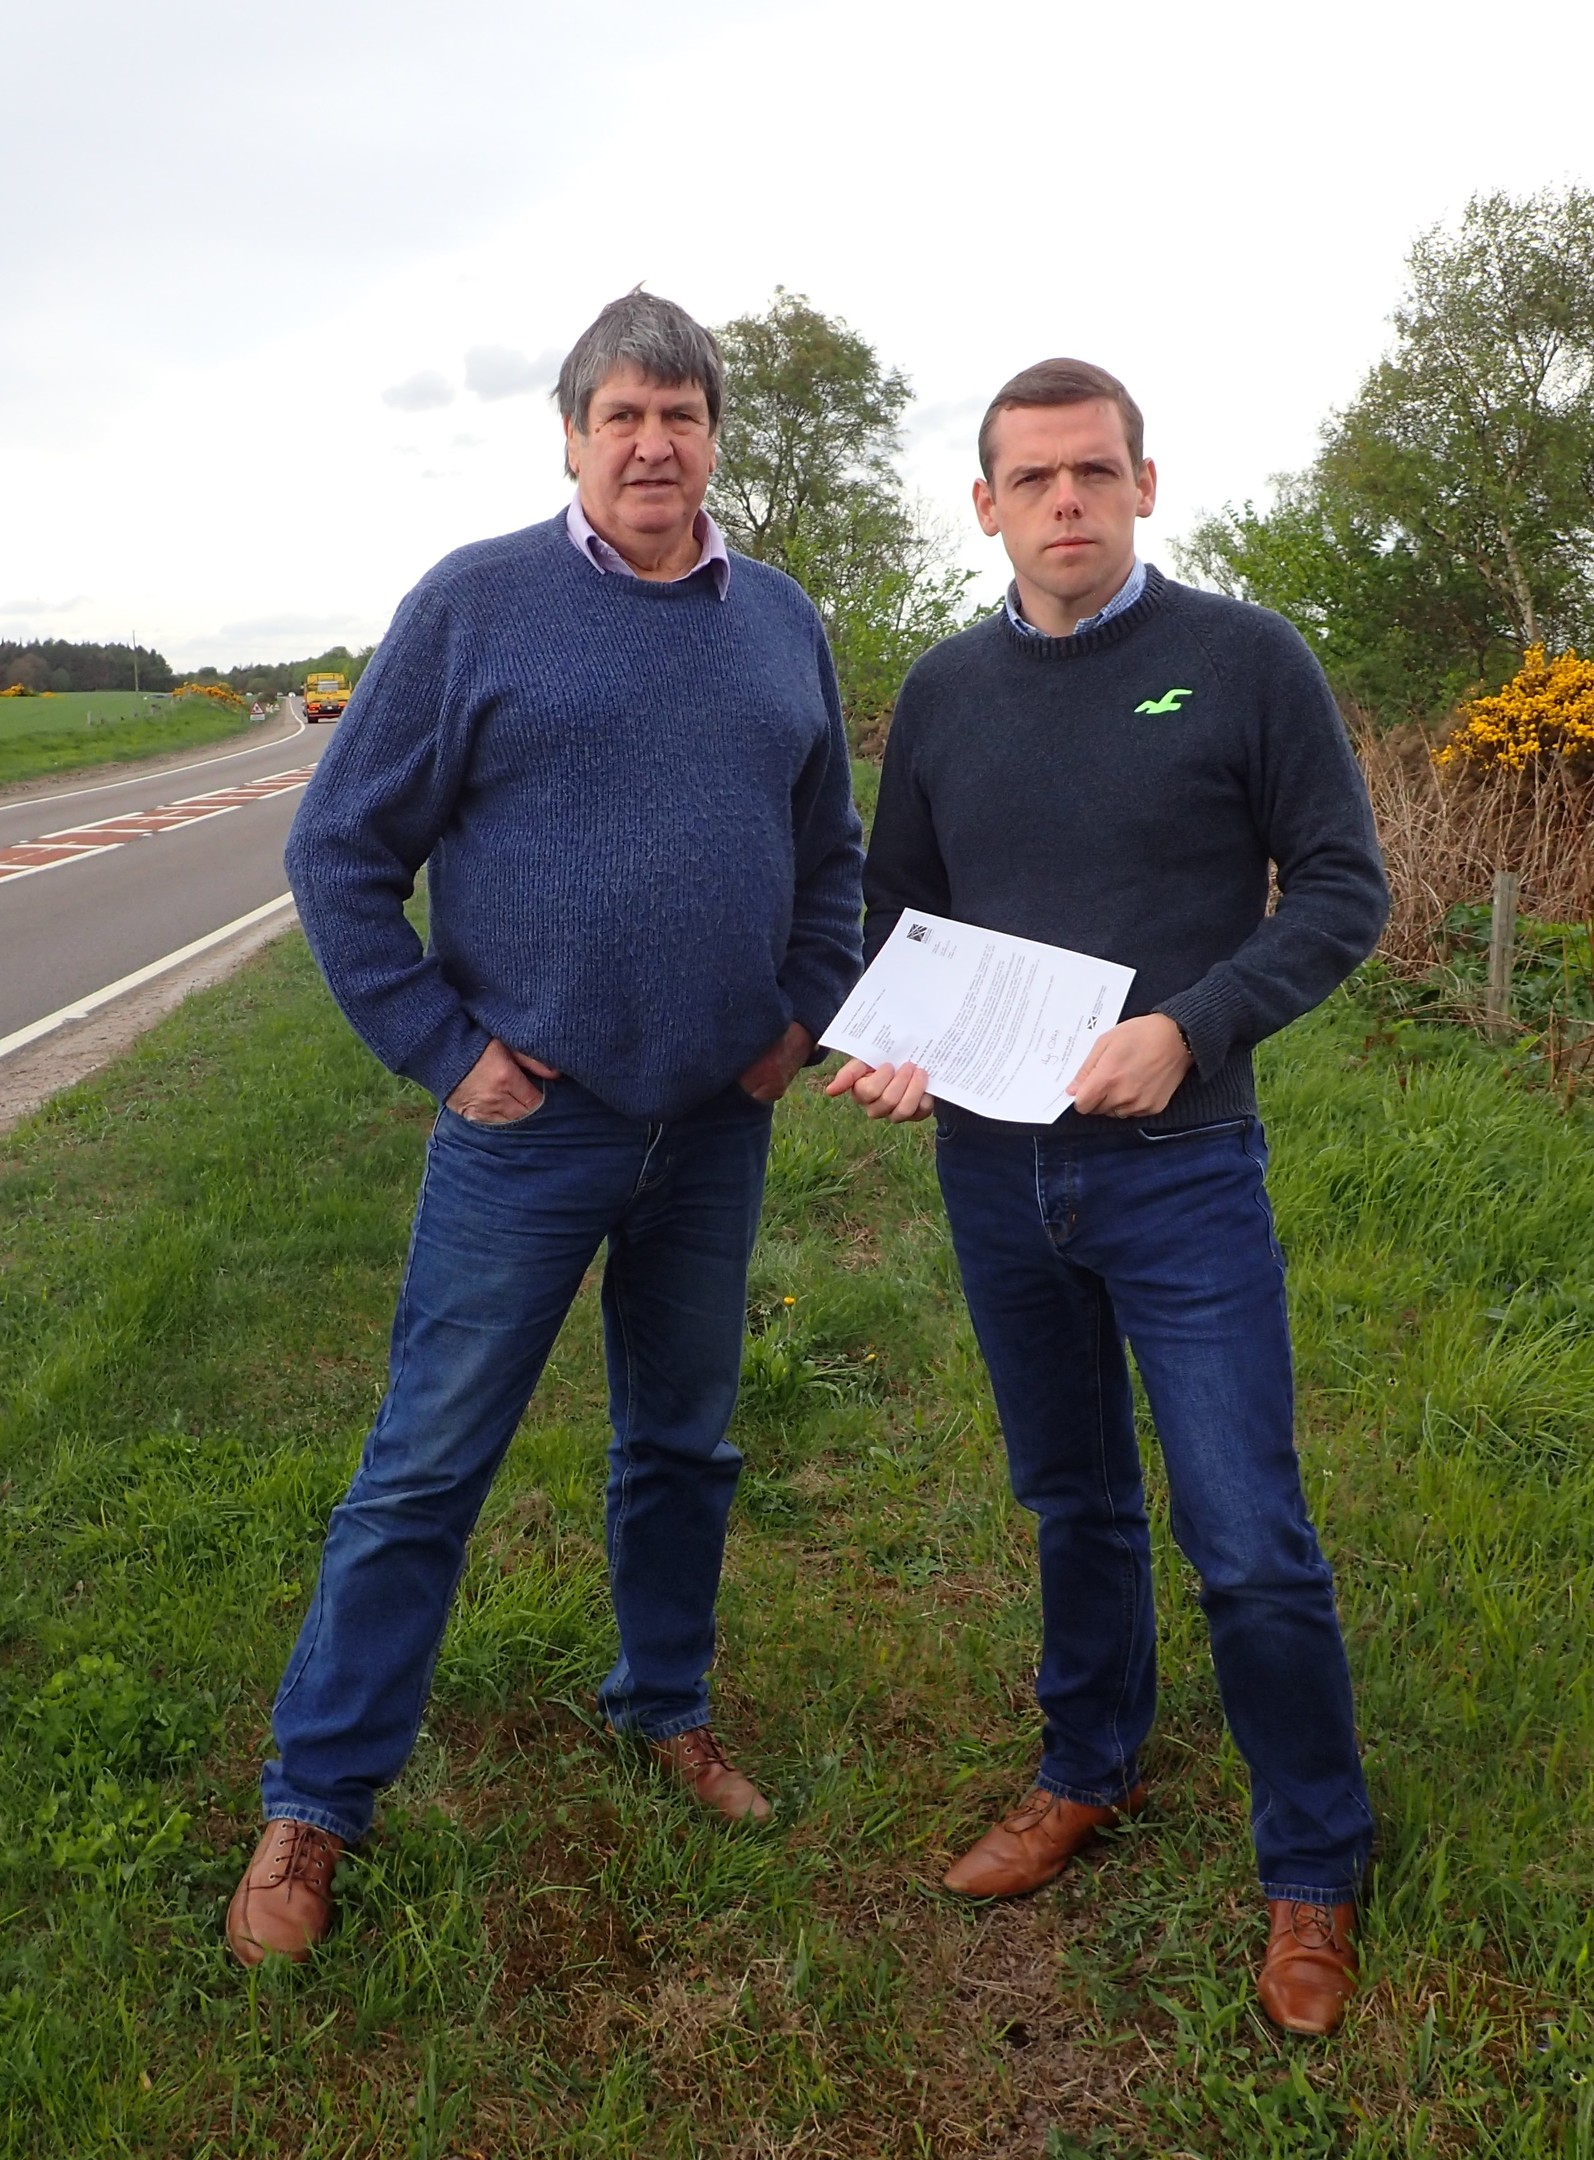 Moray MP Douglas Ross with campaigner Neil Jeronim